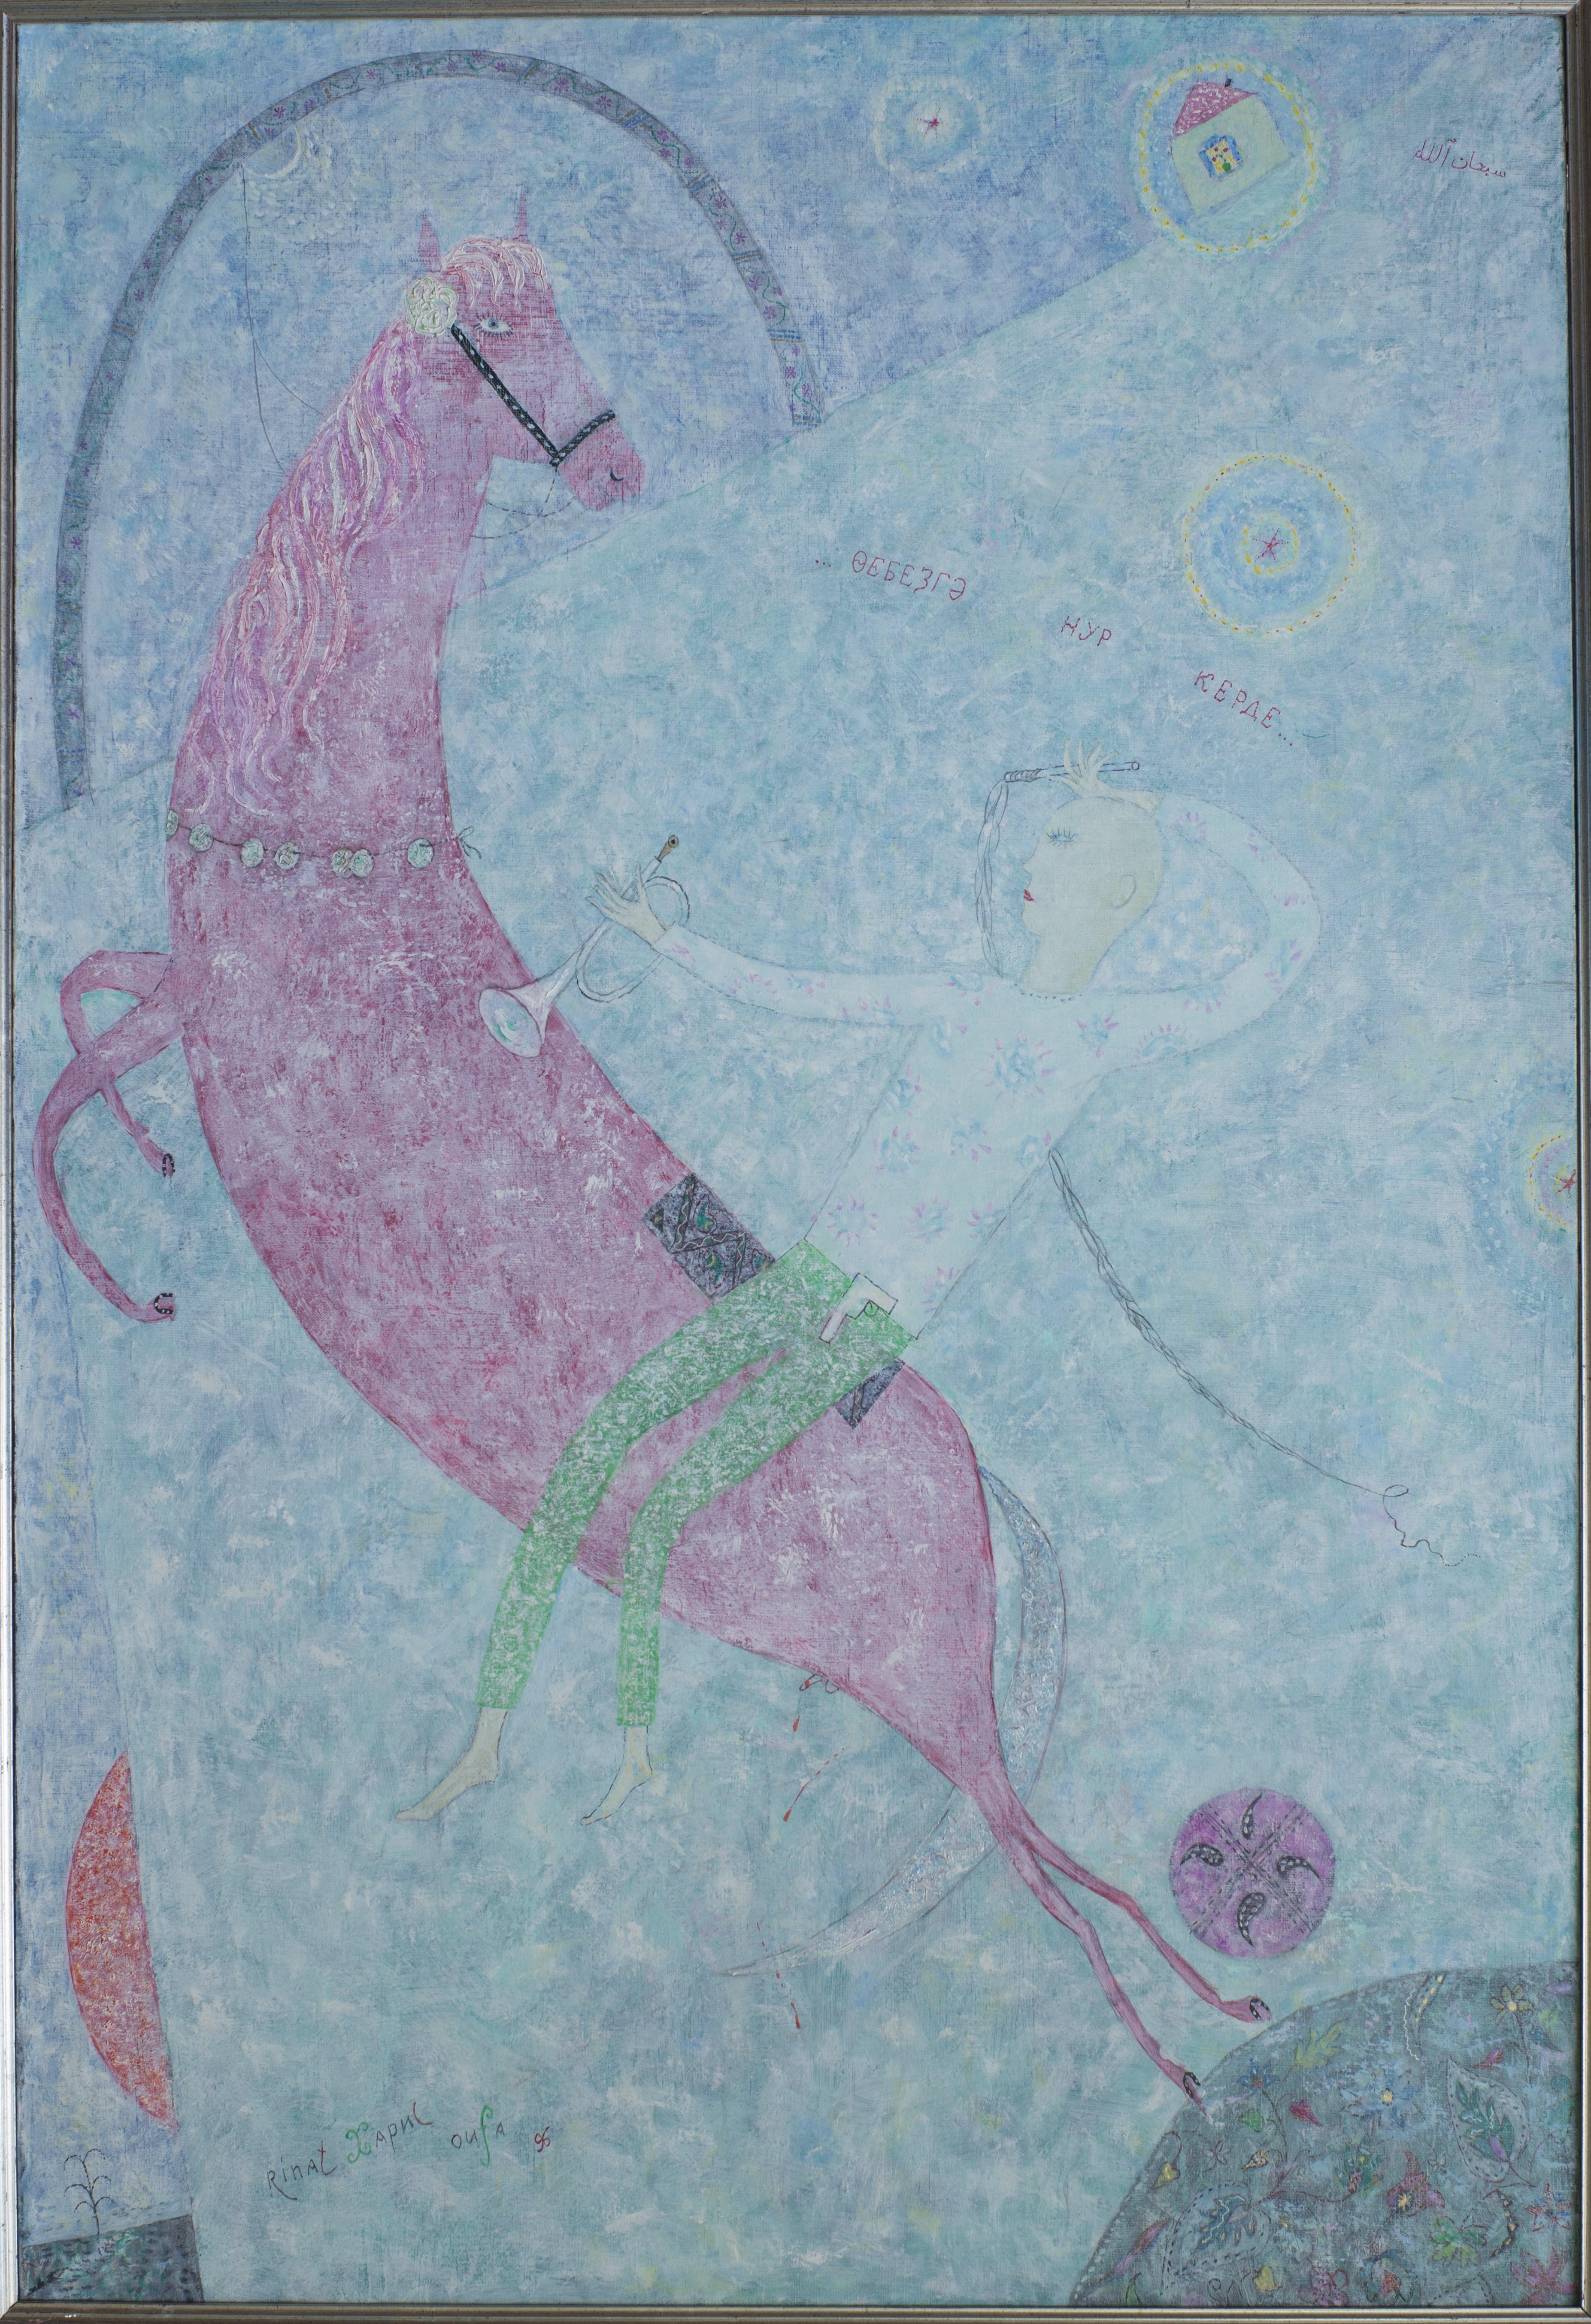 Ринат Харисов. Розовый конь. 1996. Холст, масло. 130х89. Коллекция Фонда Марджани.jpg